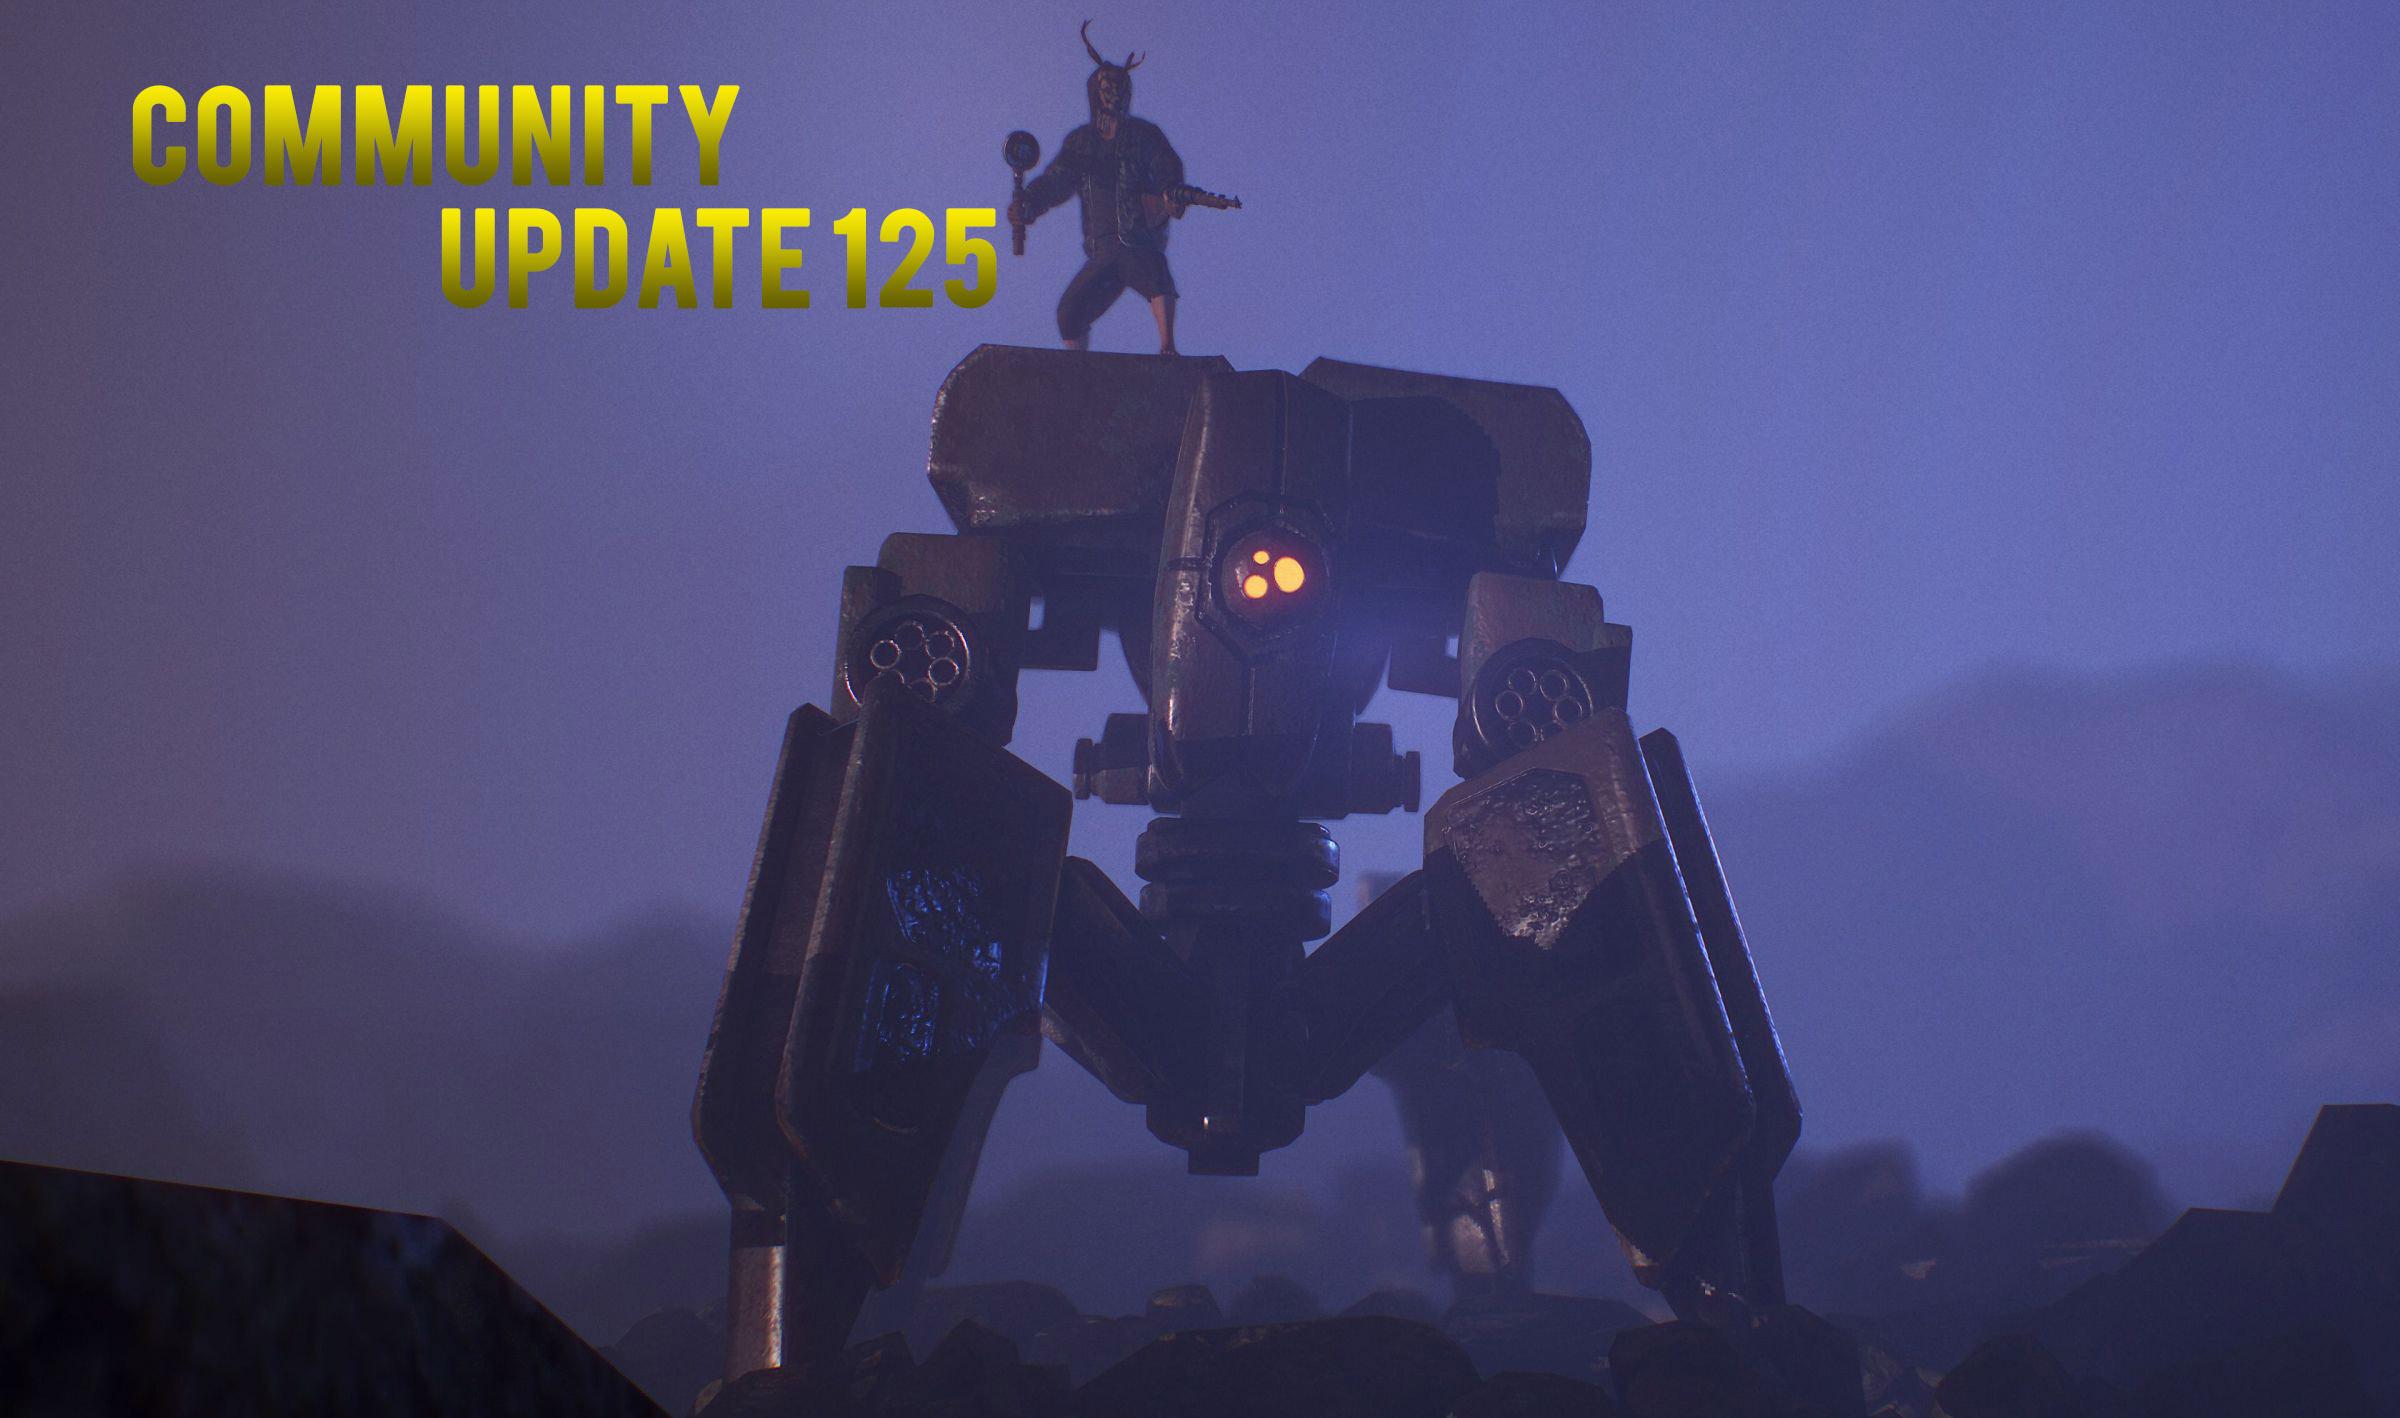 Community Update 125